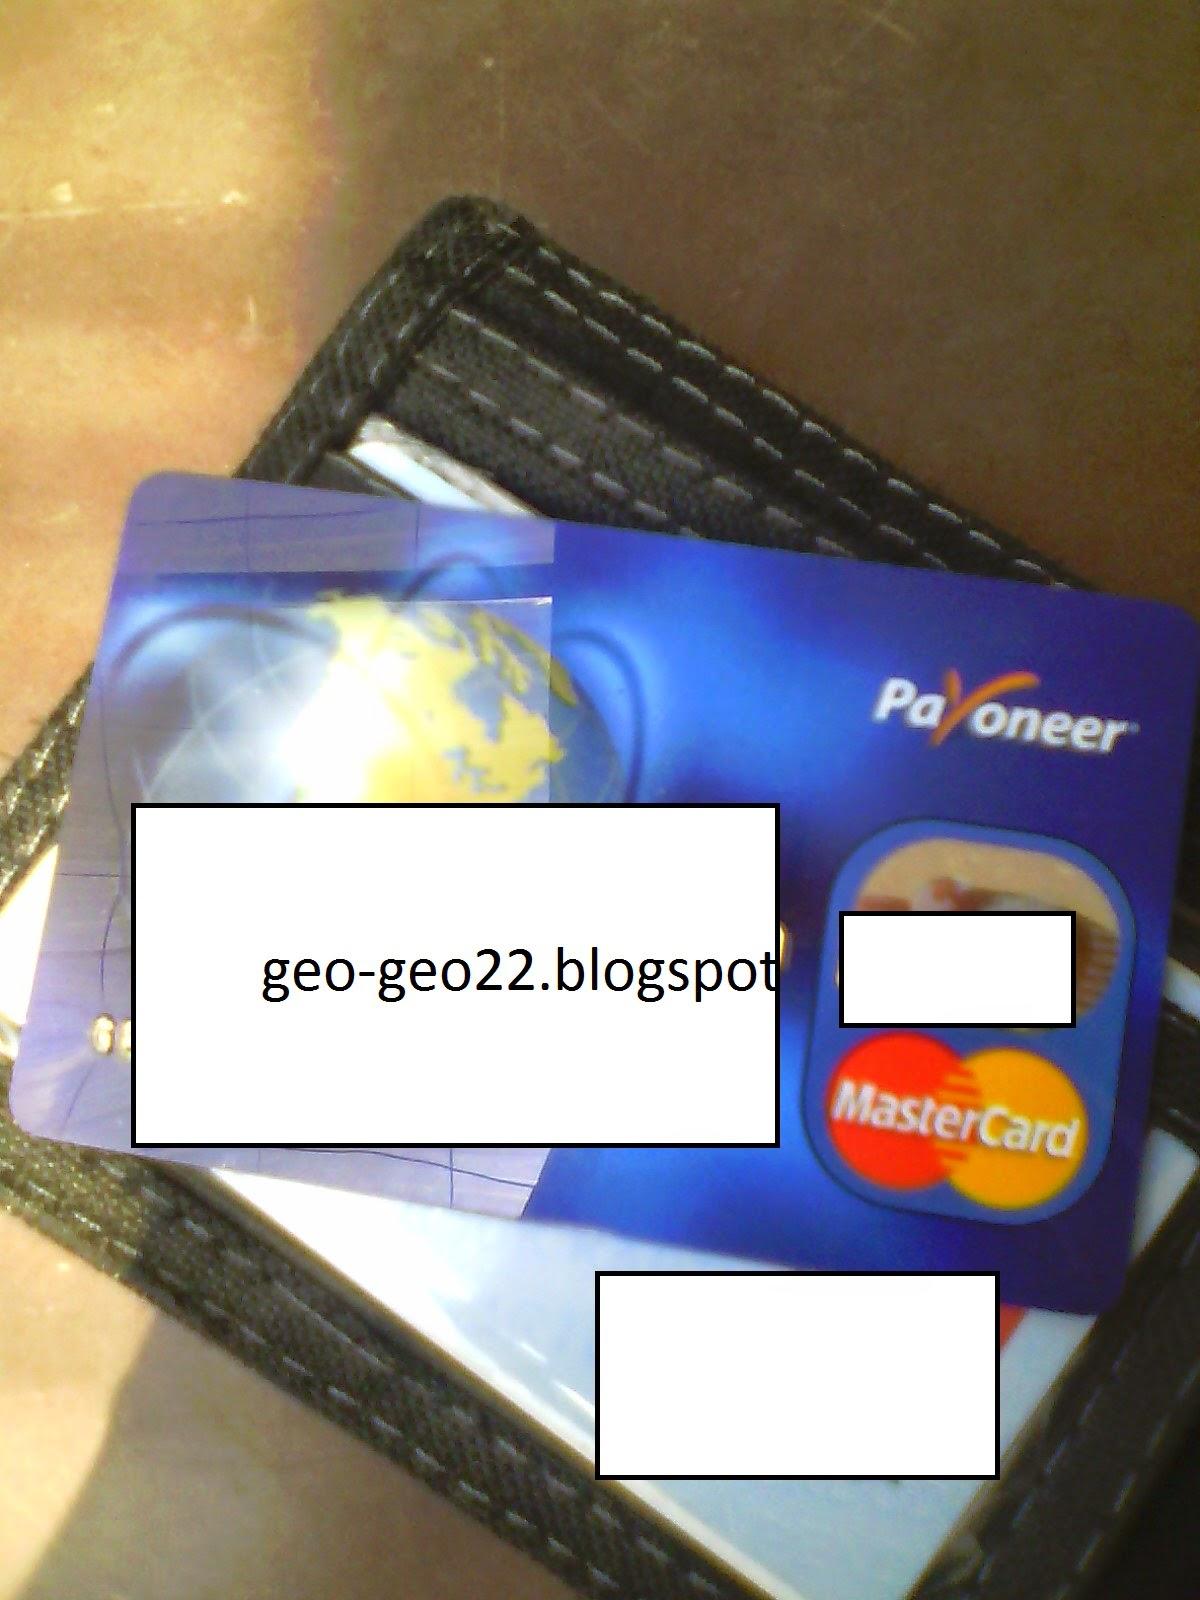 http://geo-geo22.blogspot.com/